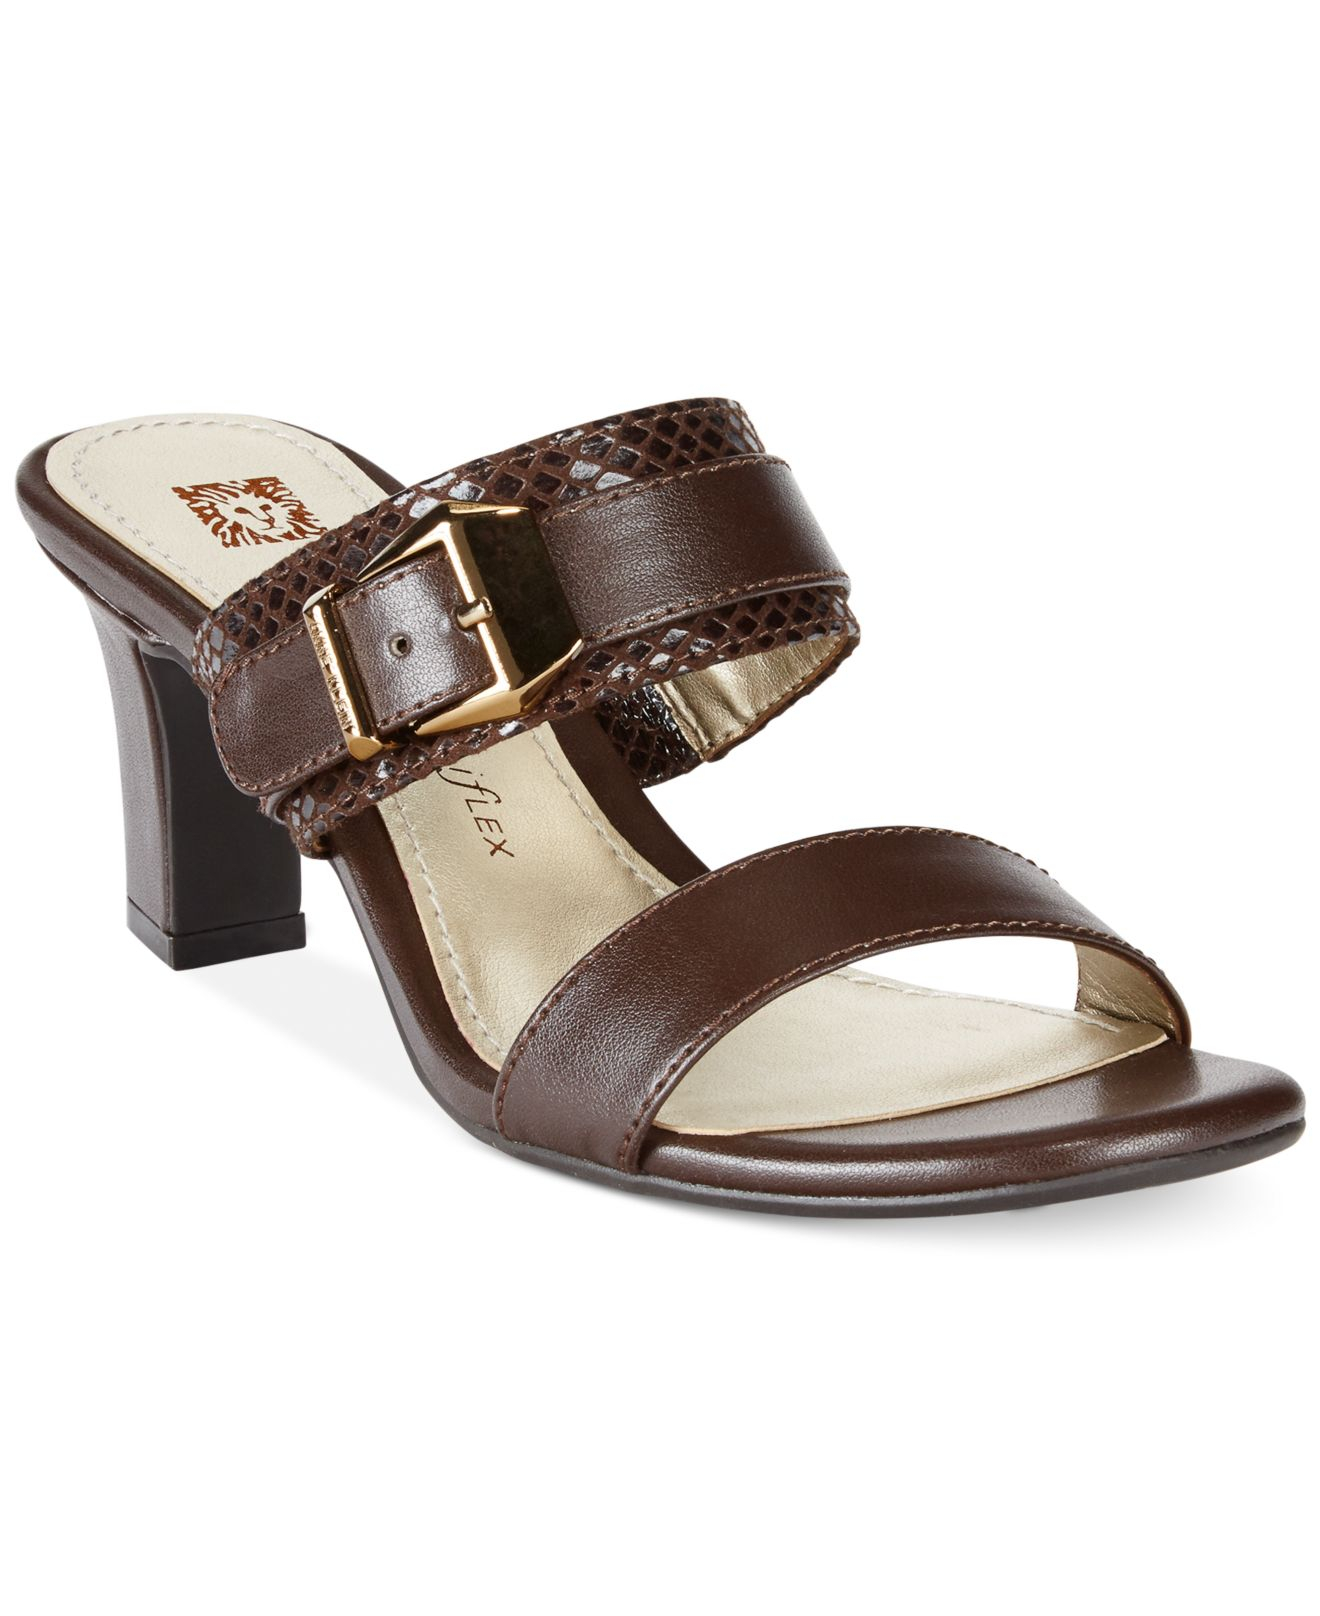 Anne Klein Dress Shoes